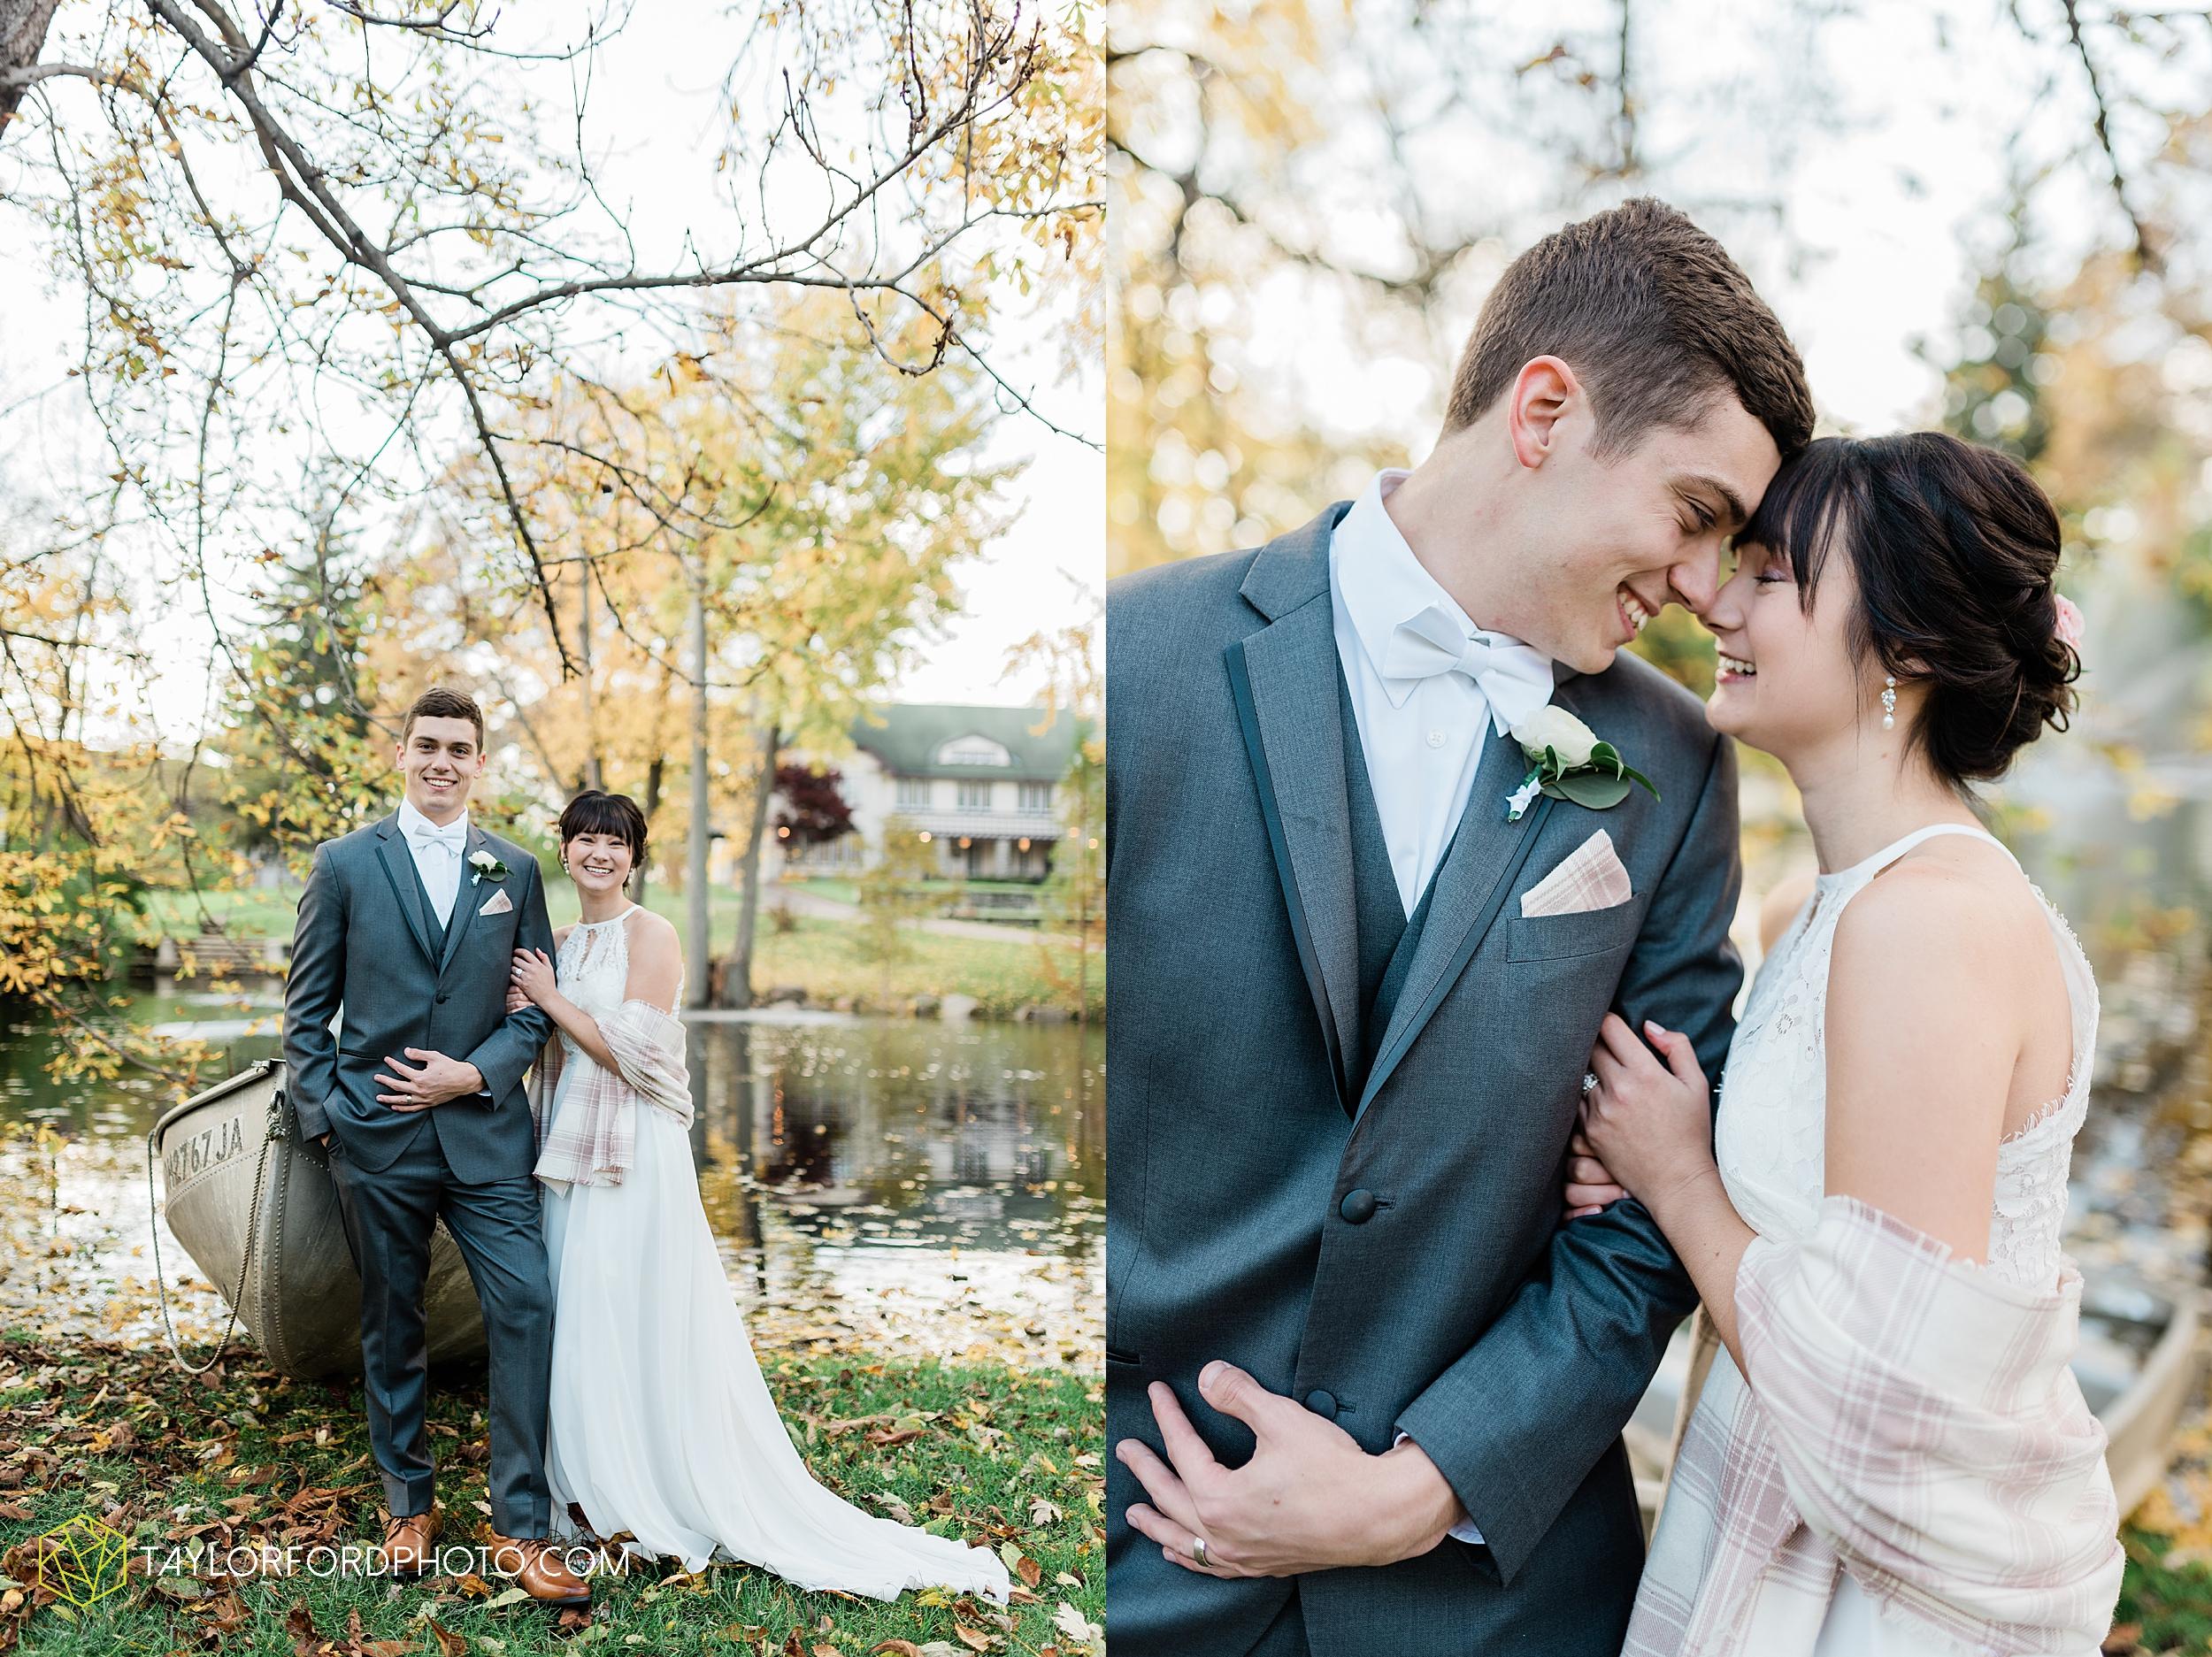 marissa-nicole-nick-daeger-orrmont-estate-farm-wedding-piqua-dayton-troy-ohio-fall-photographer-taylor-ford-photography_1514.jpg